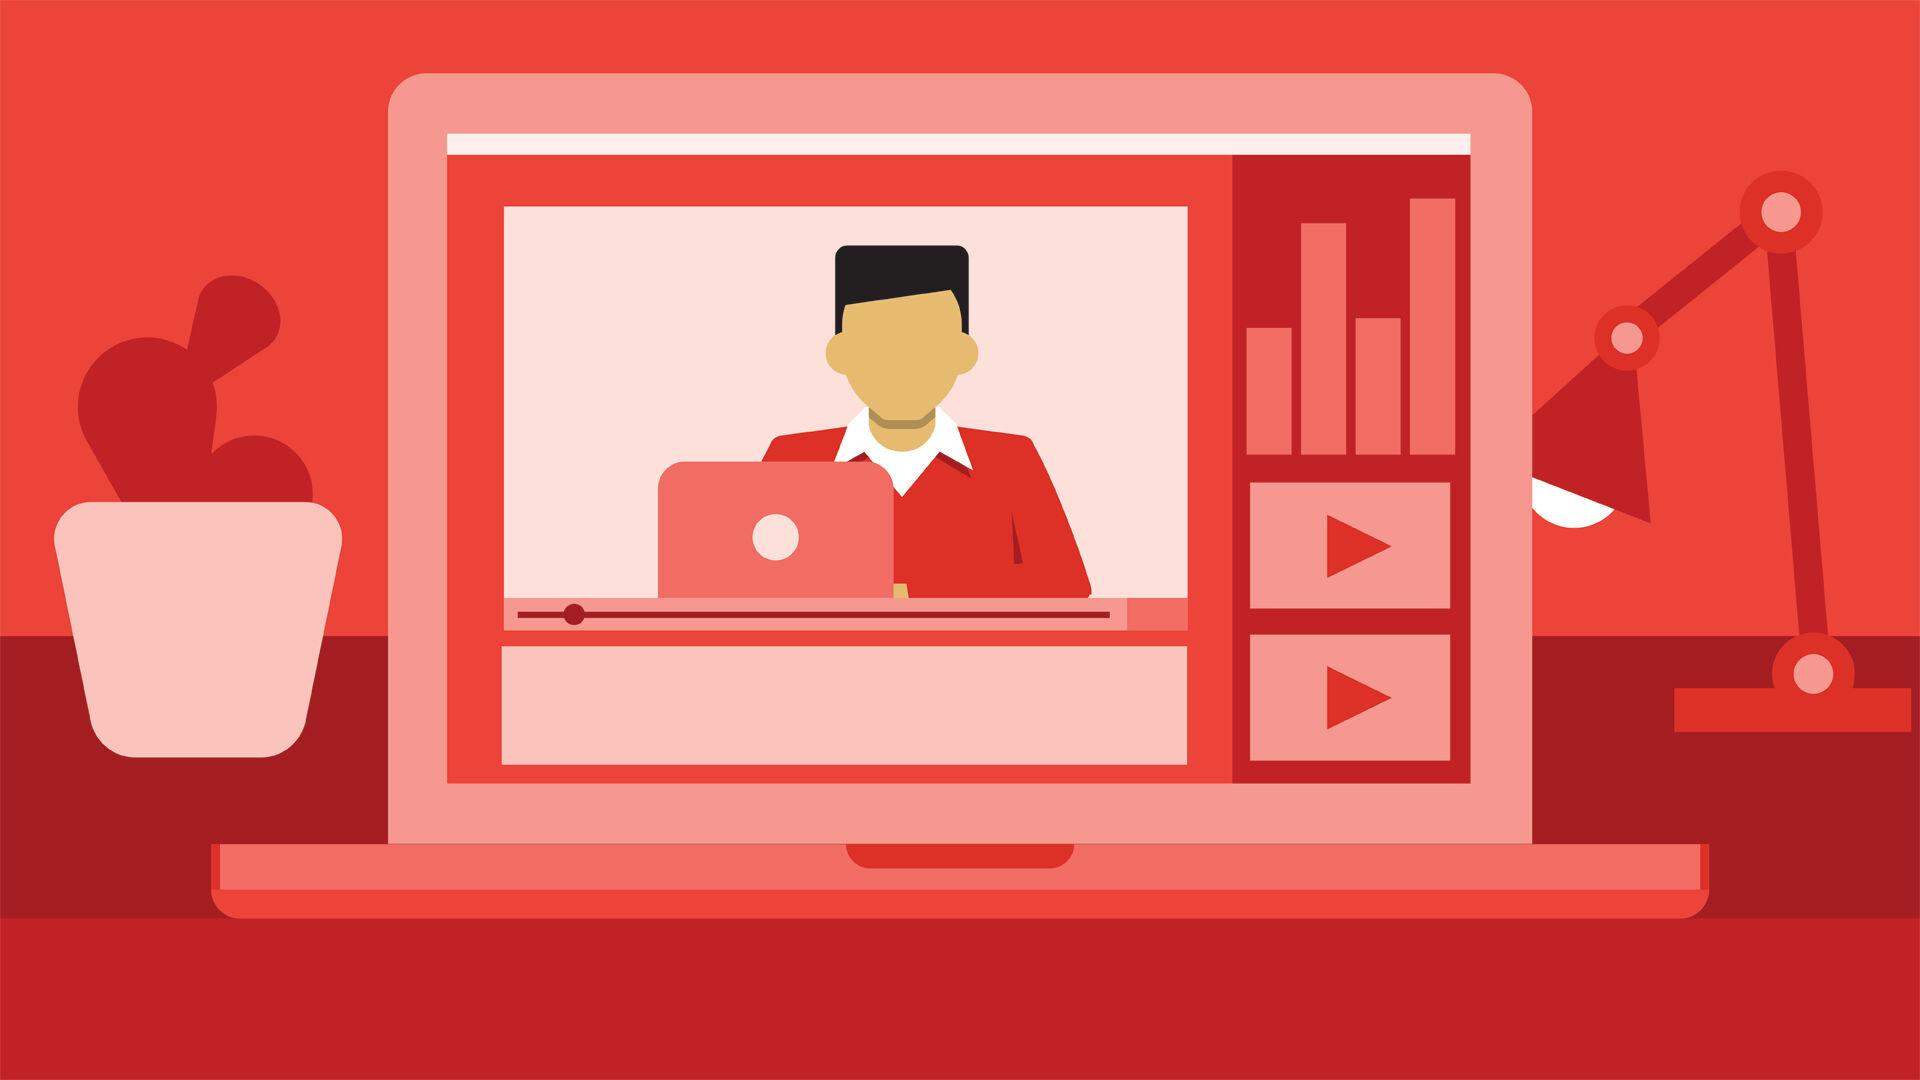 Cara Menghasilkan 100 Juta Per Bulan Dari Youtube 1